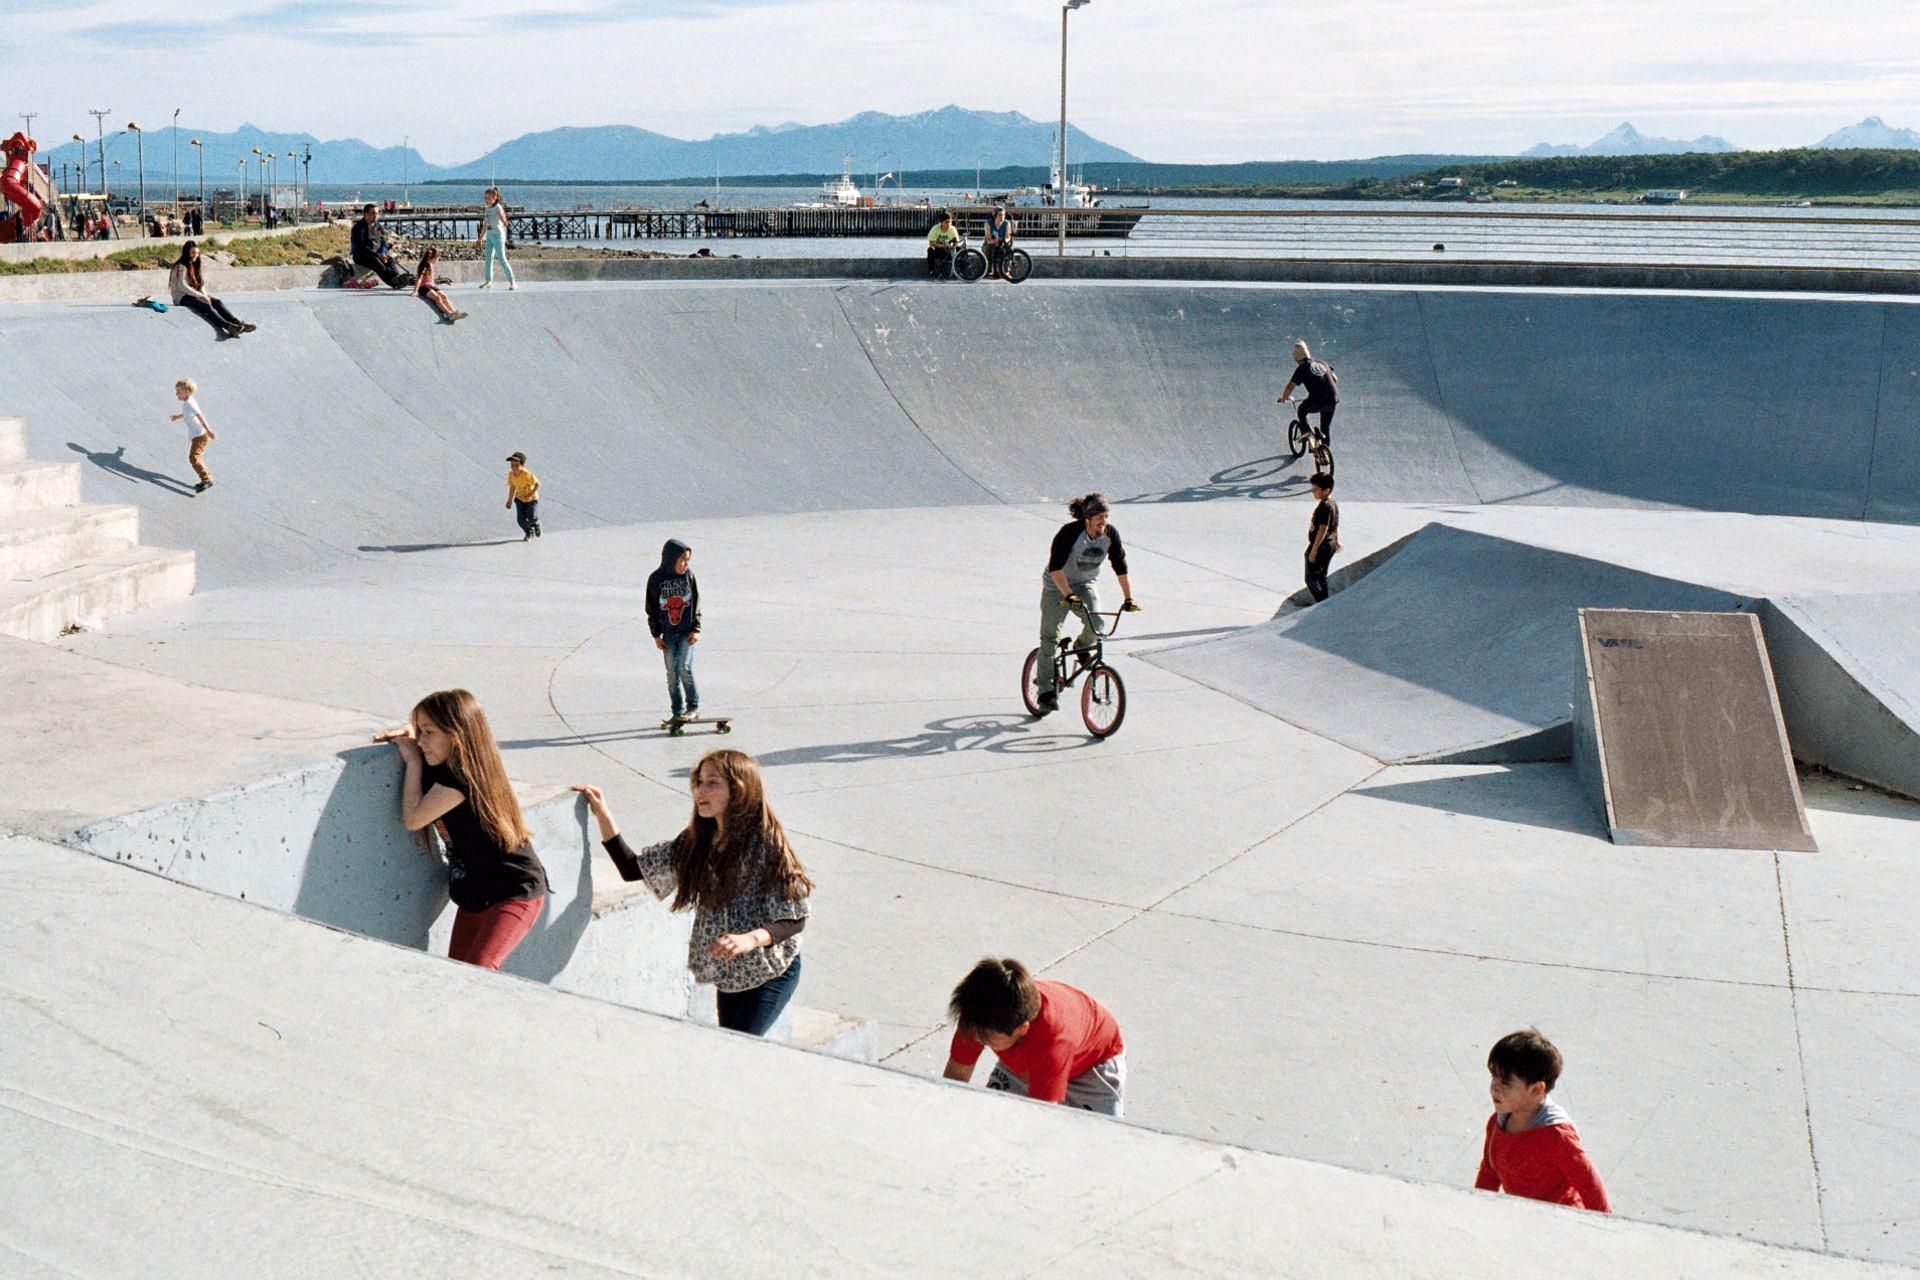 Skate park du sud